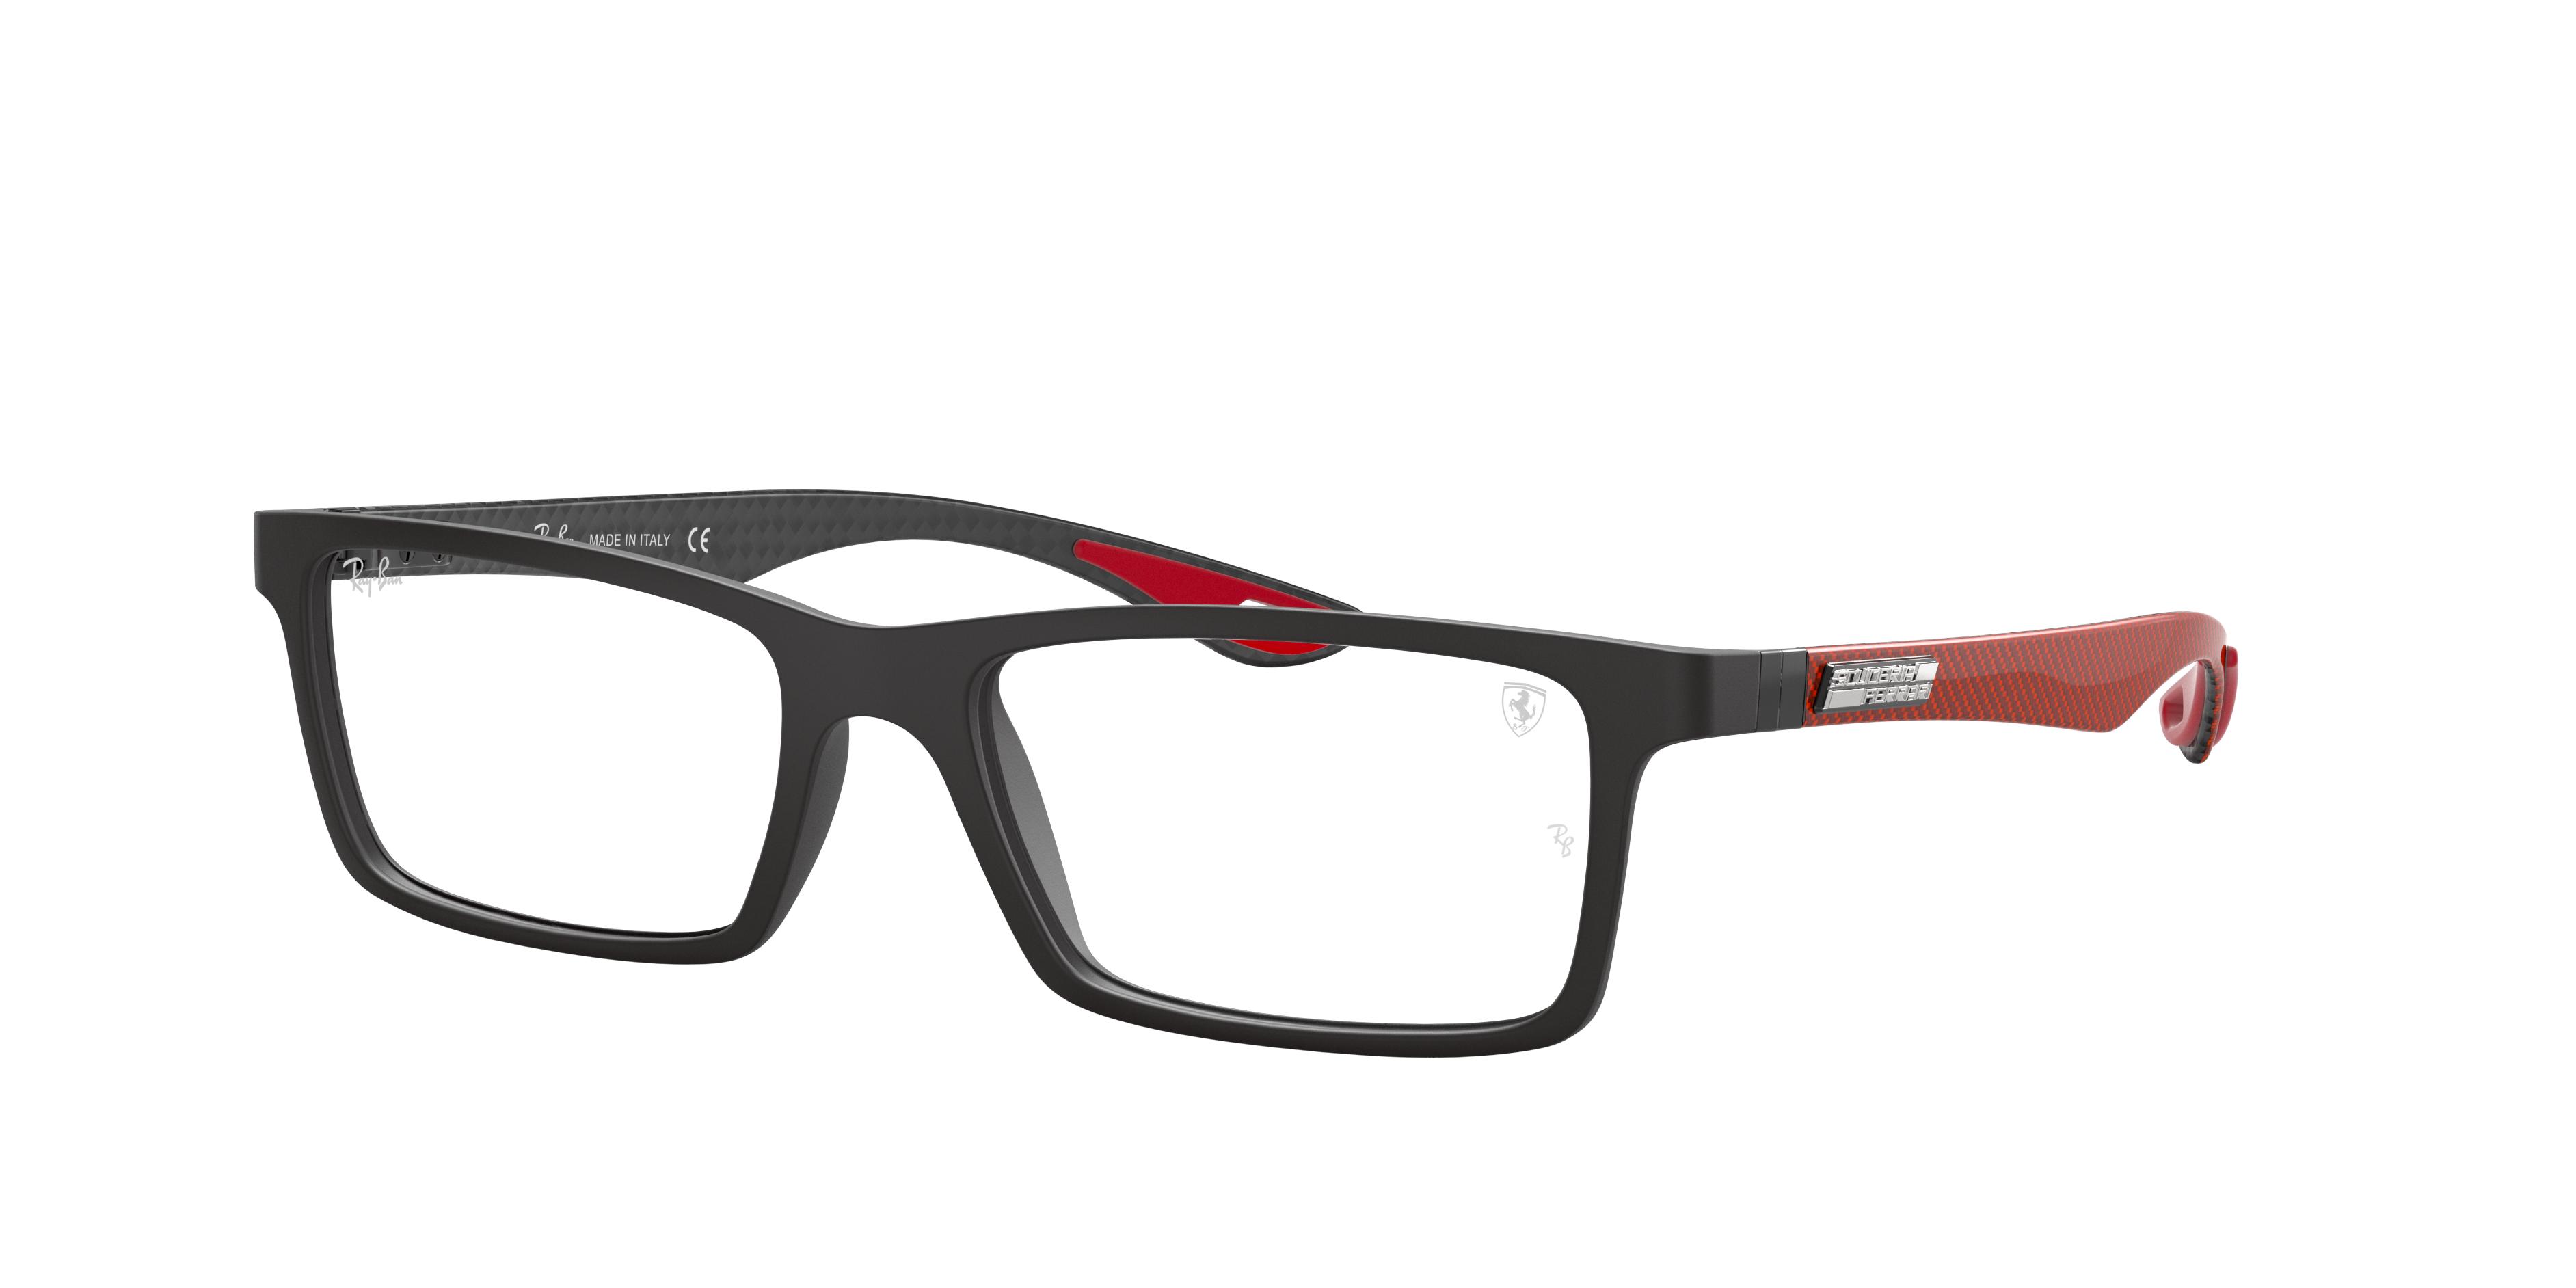 Ray Ban Eyeglasses Rb8901m Black Injected 0rx8901mf63455 Ray Ban Eu